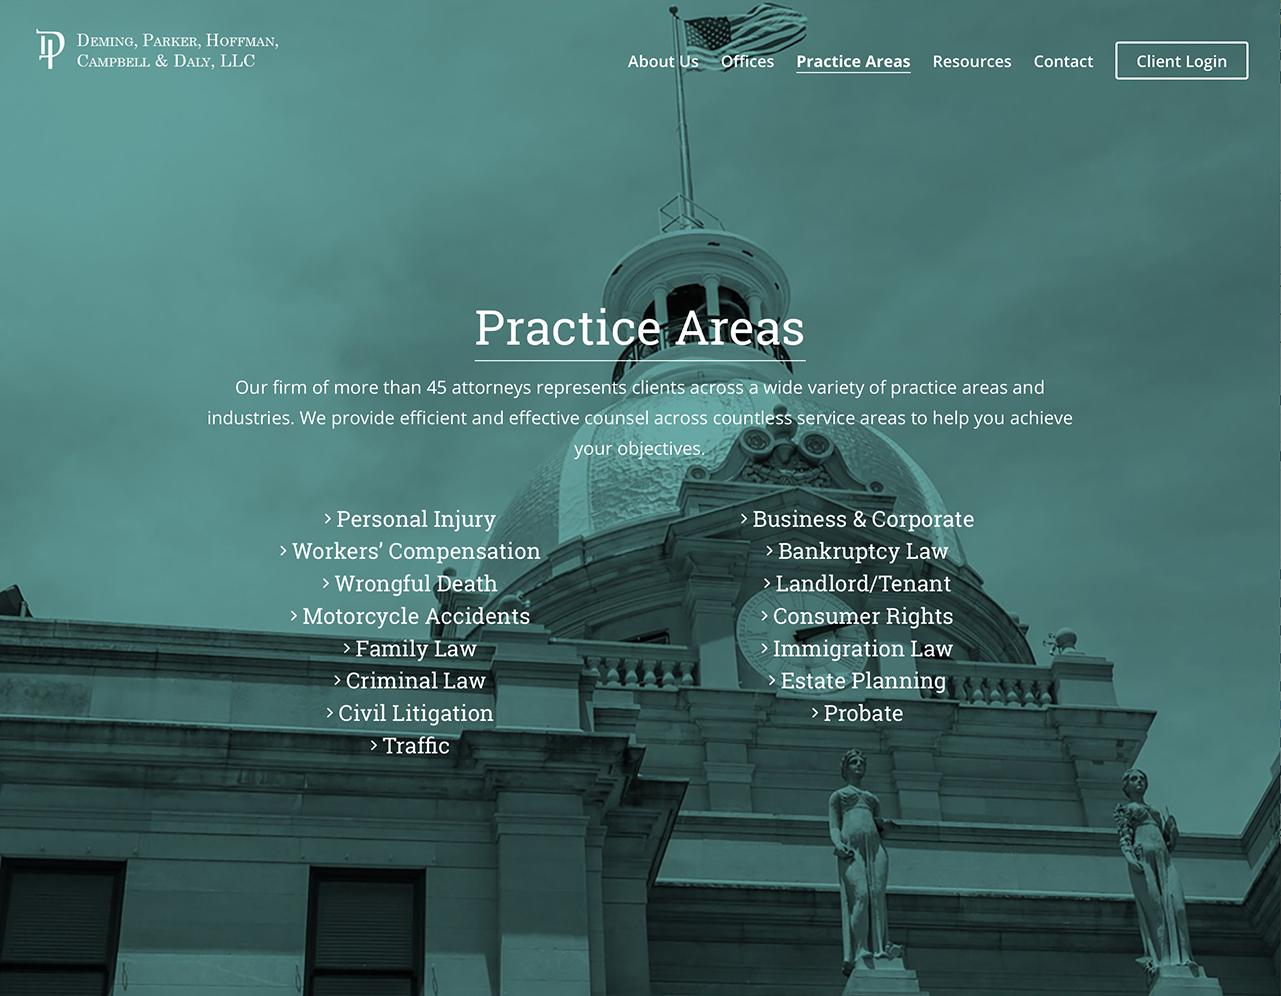 Portfolio Screenshot of Deminglaw Practice Area